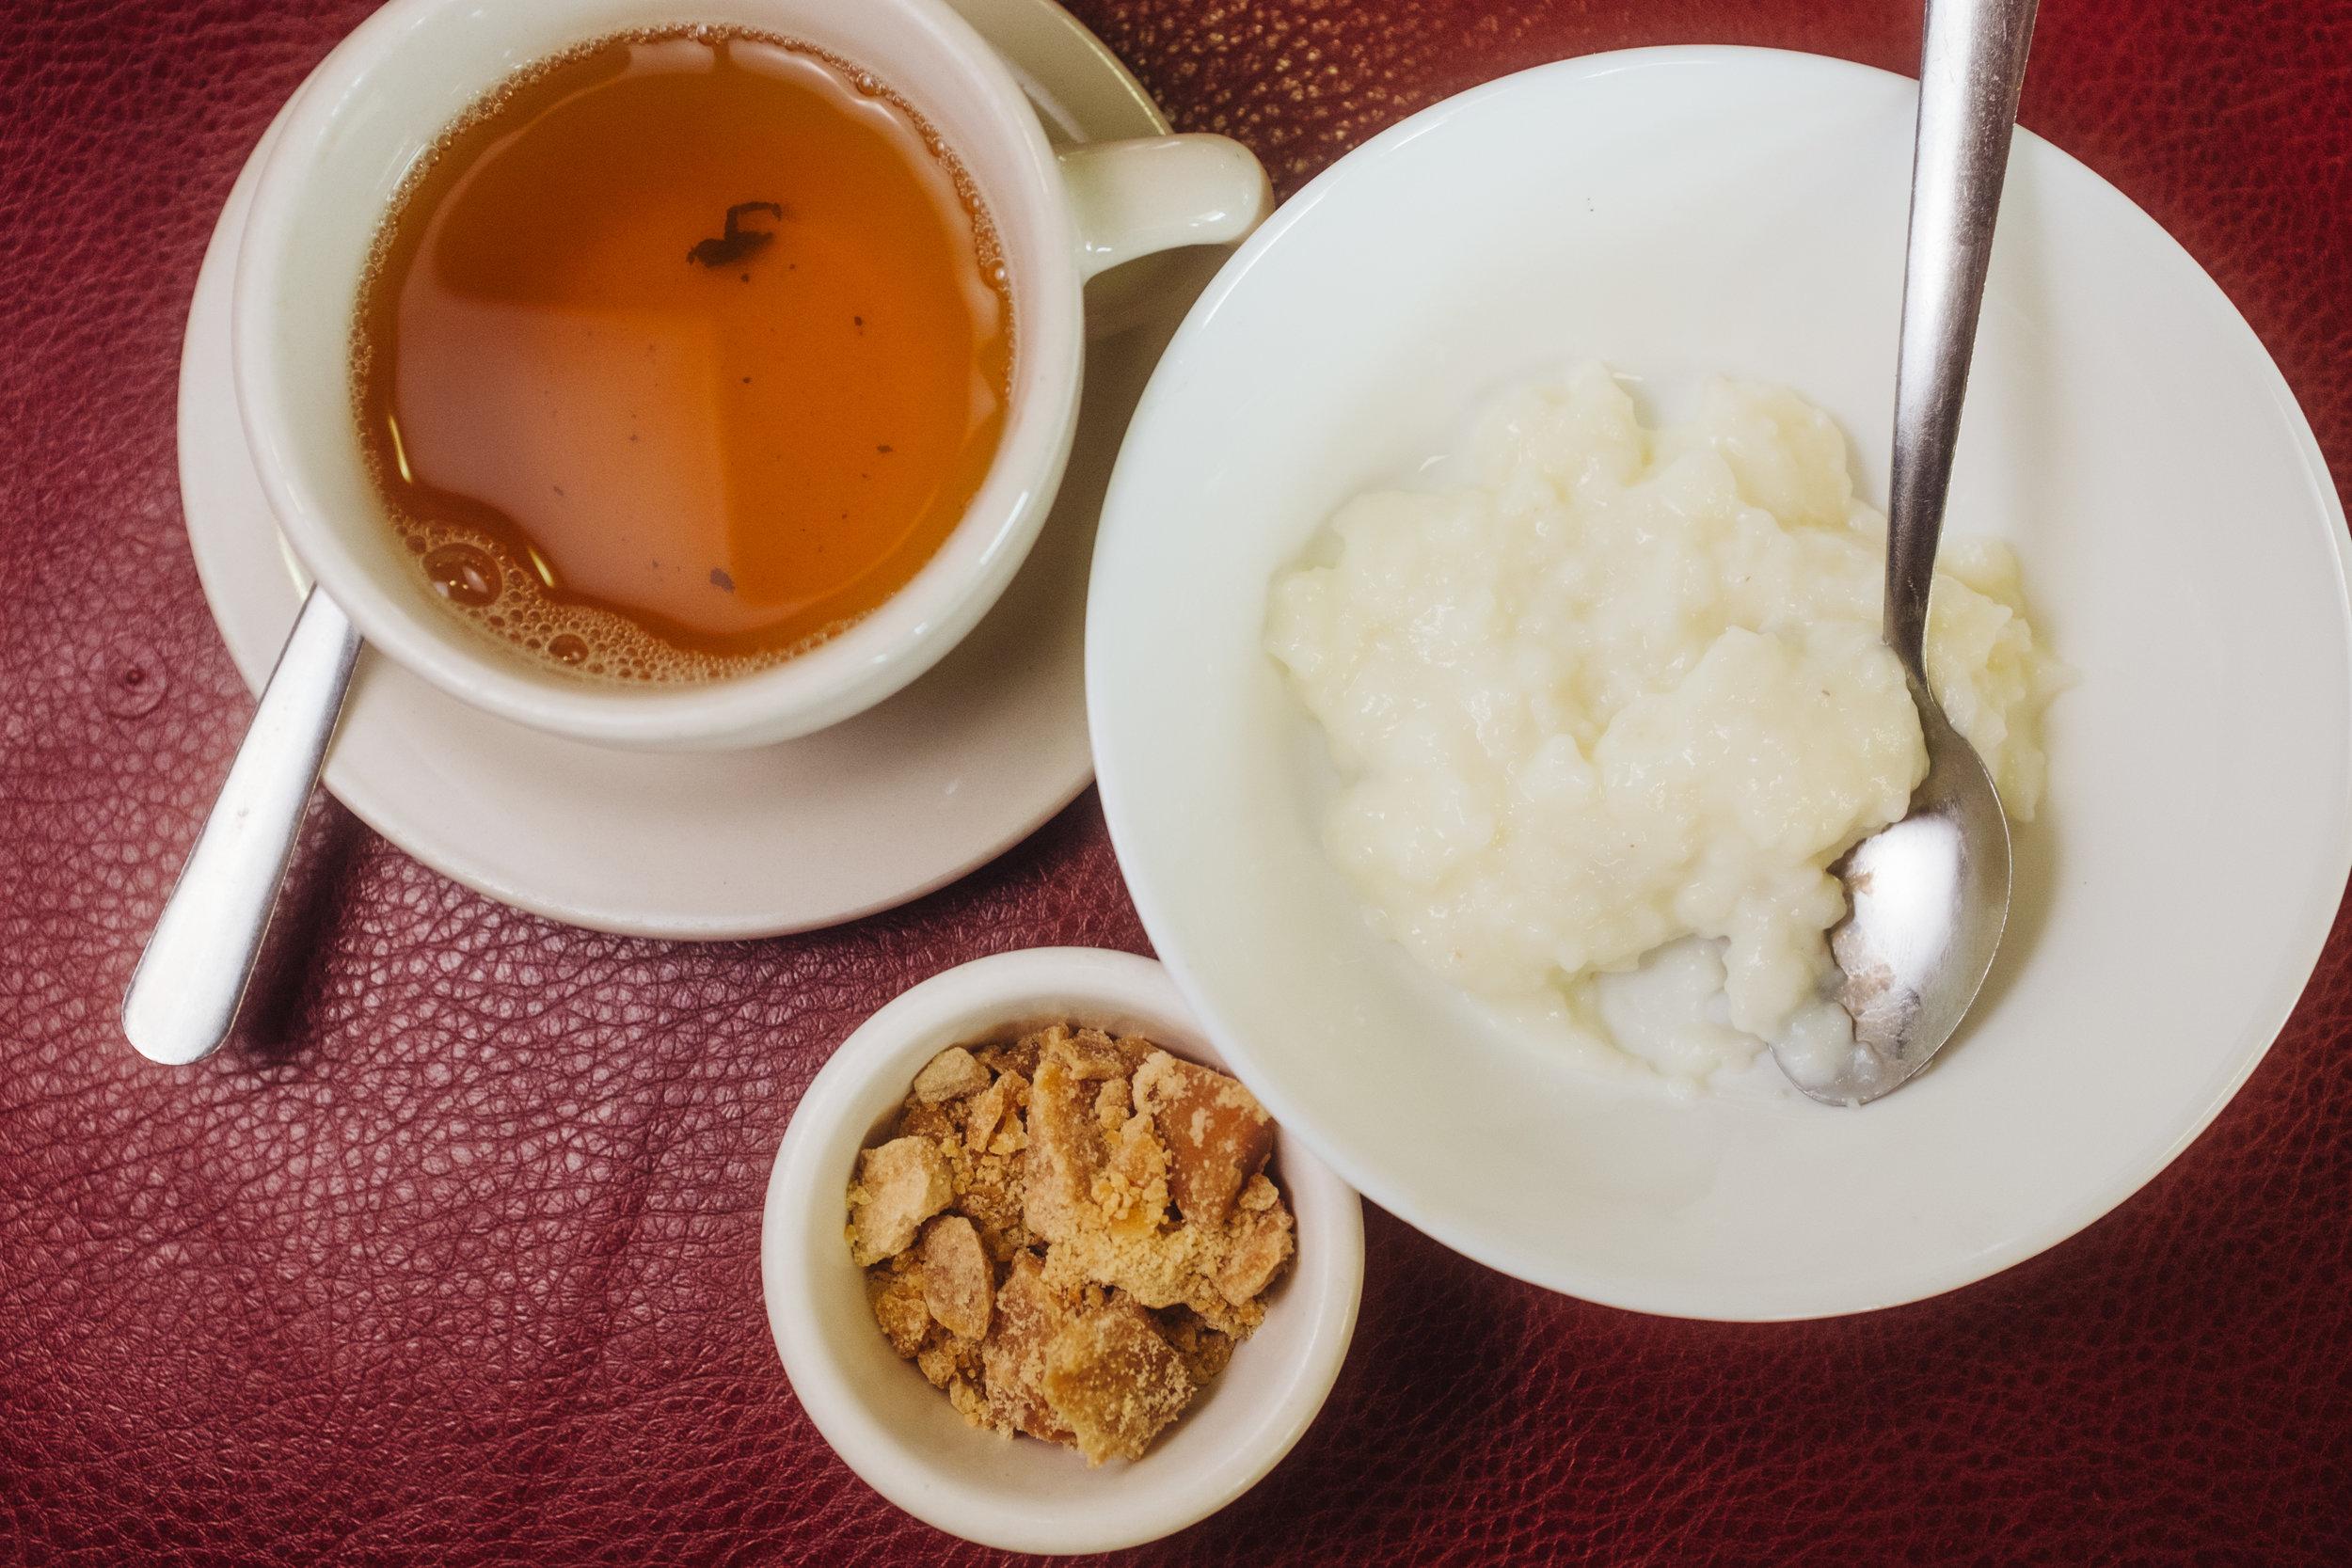 Green Tea, Qand (tea soaked sugar blocks), and Shir Berenj (Rice pudding)